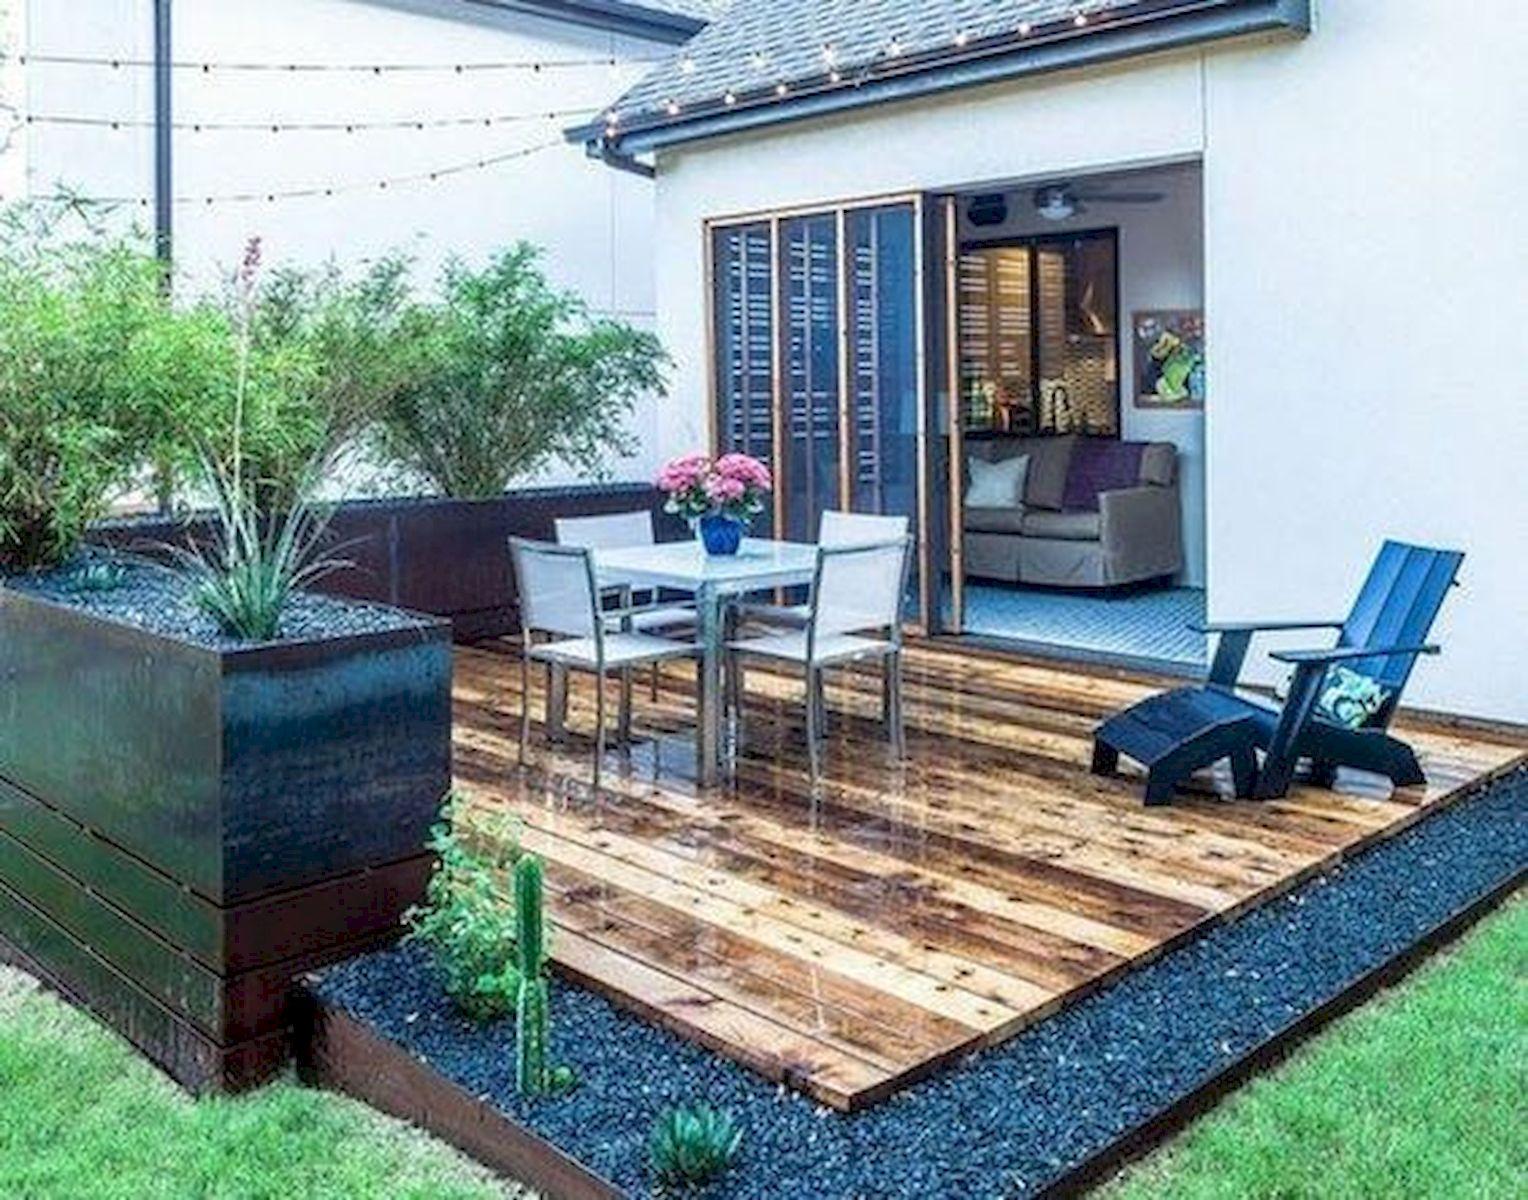 50 Fantastic Backyard Patio and Decking Design Ideas (7)